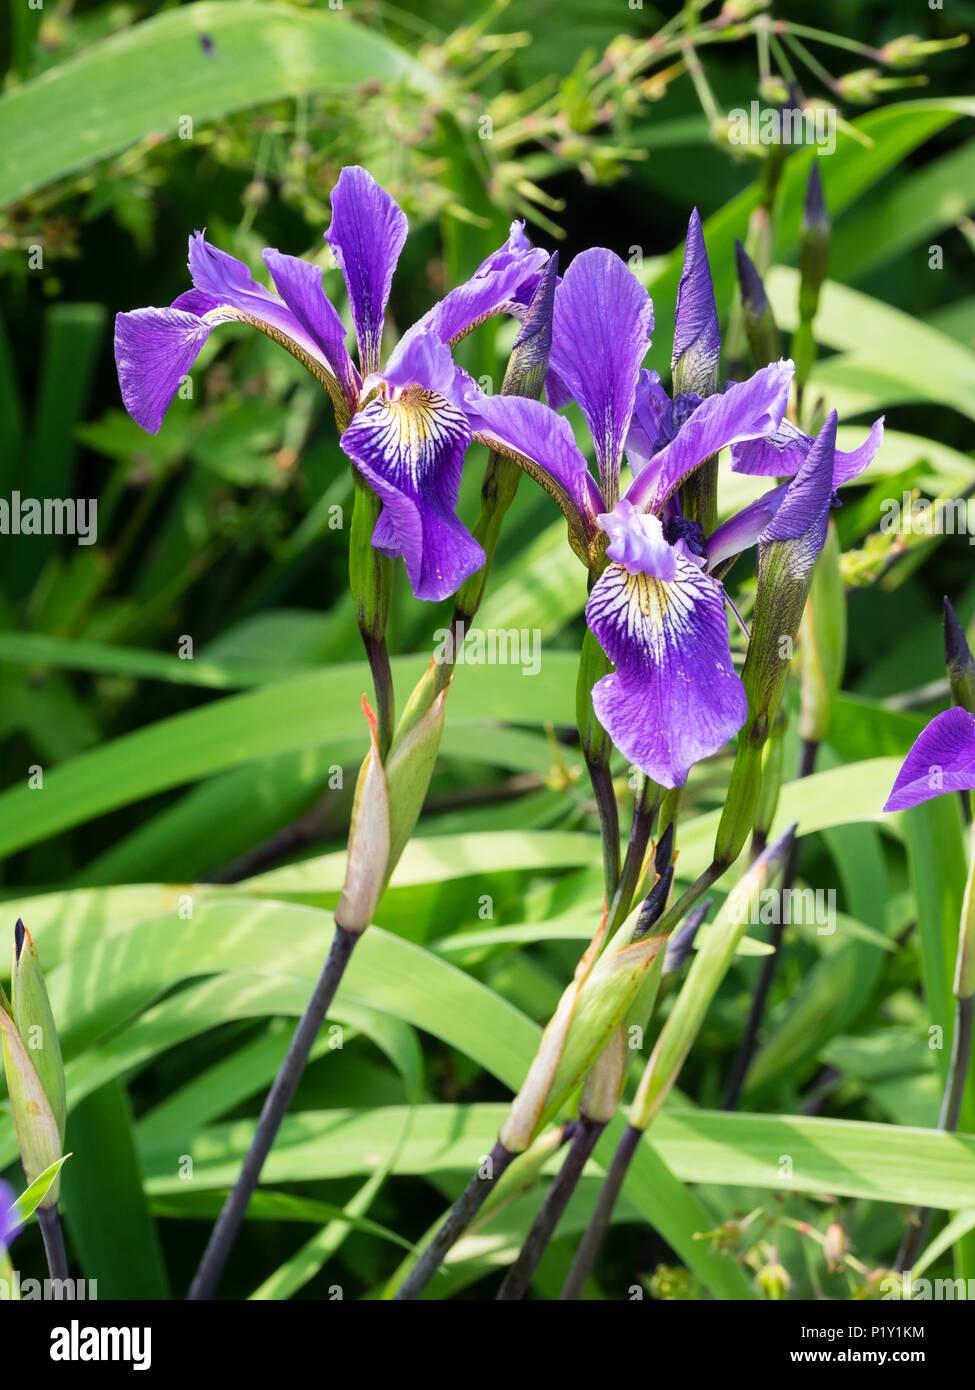 Flower and bud of the tall, upright water iris, Iris x robusta 'Dark Aura', an I.versicolor x virginica hybrid. - Stock Image